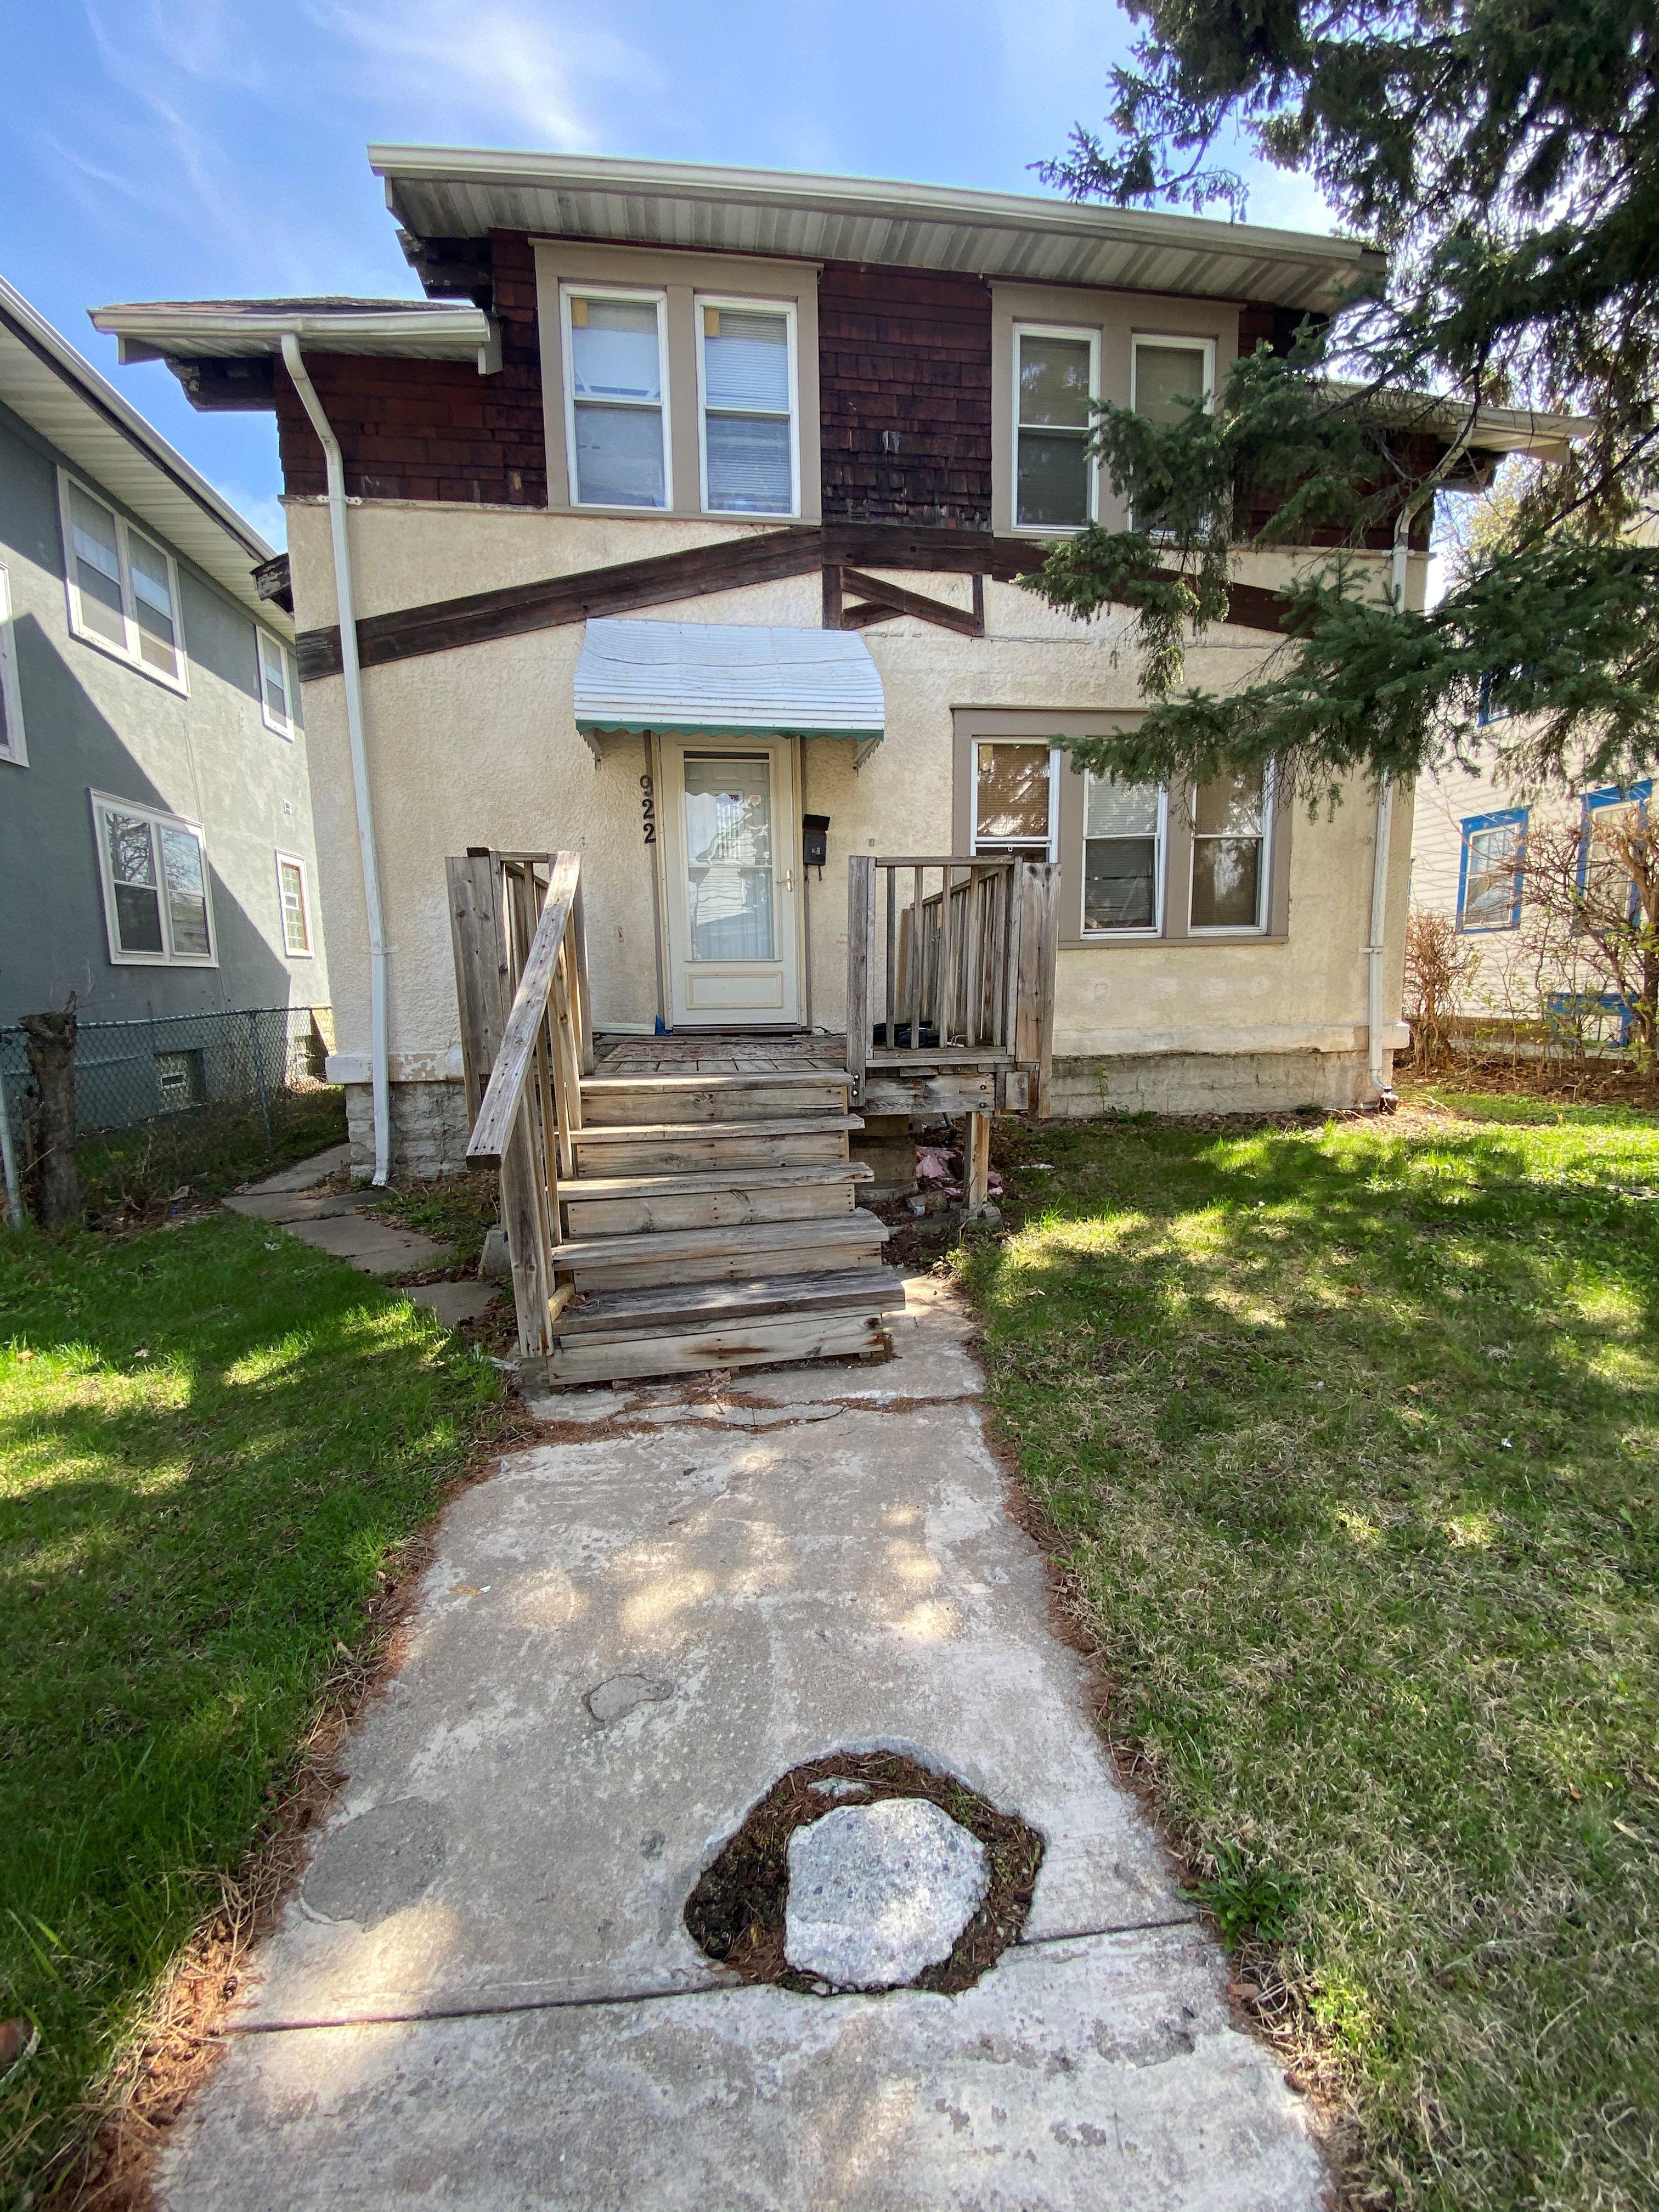 922 Penn Ave N (Image - 4)